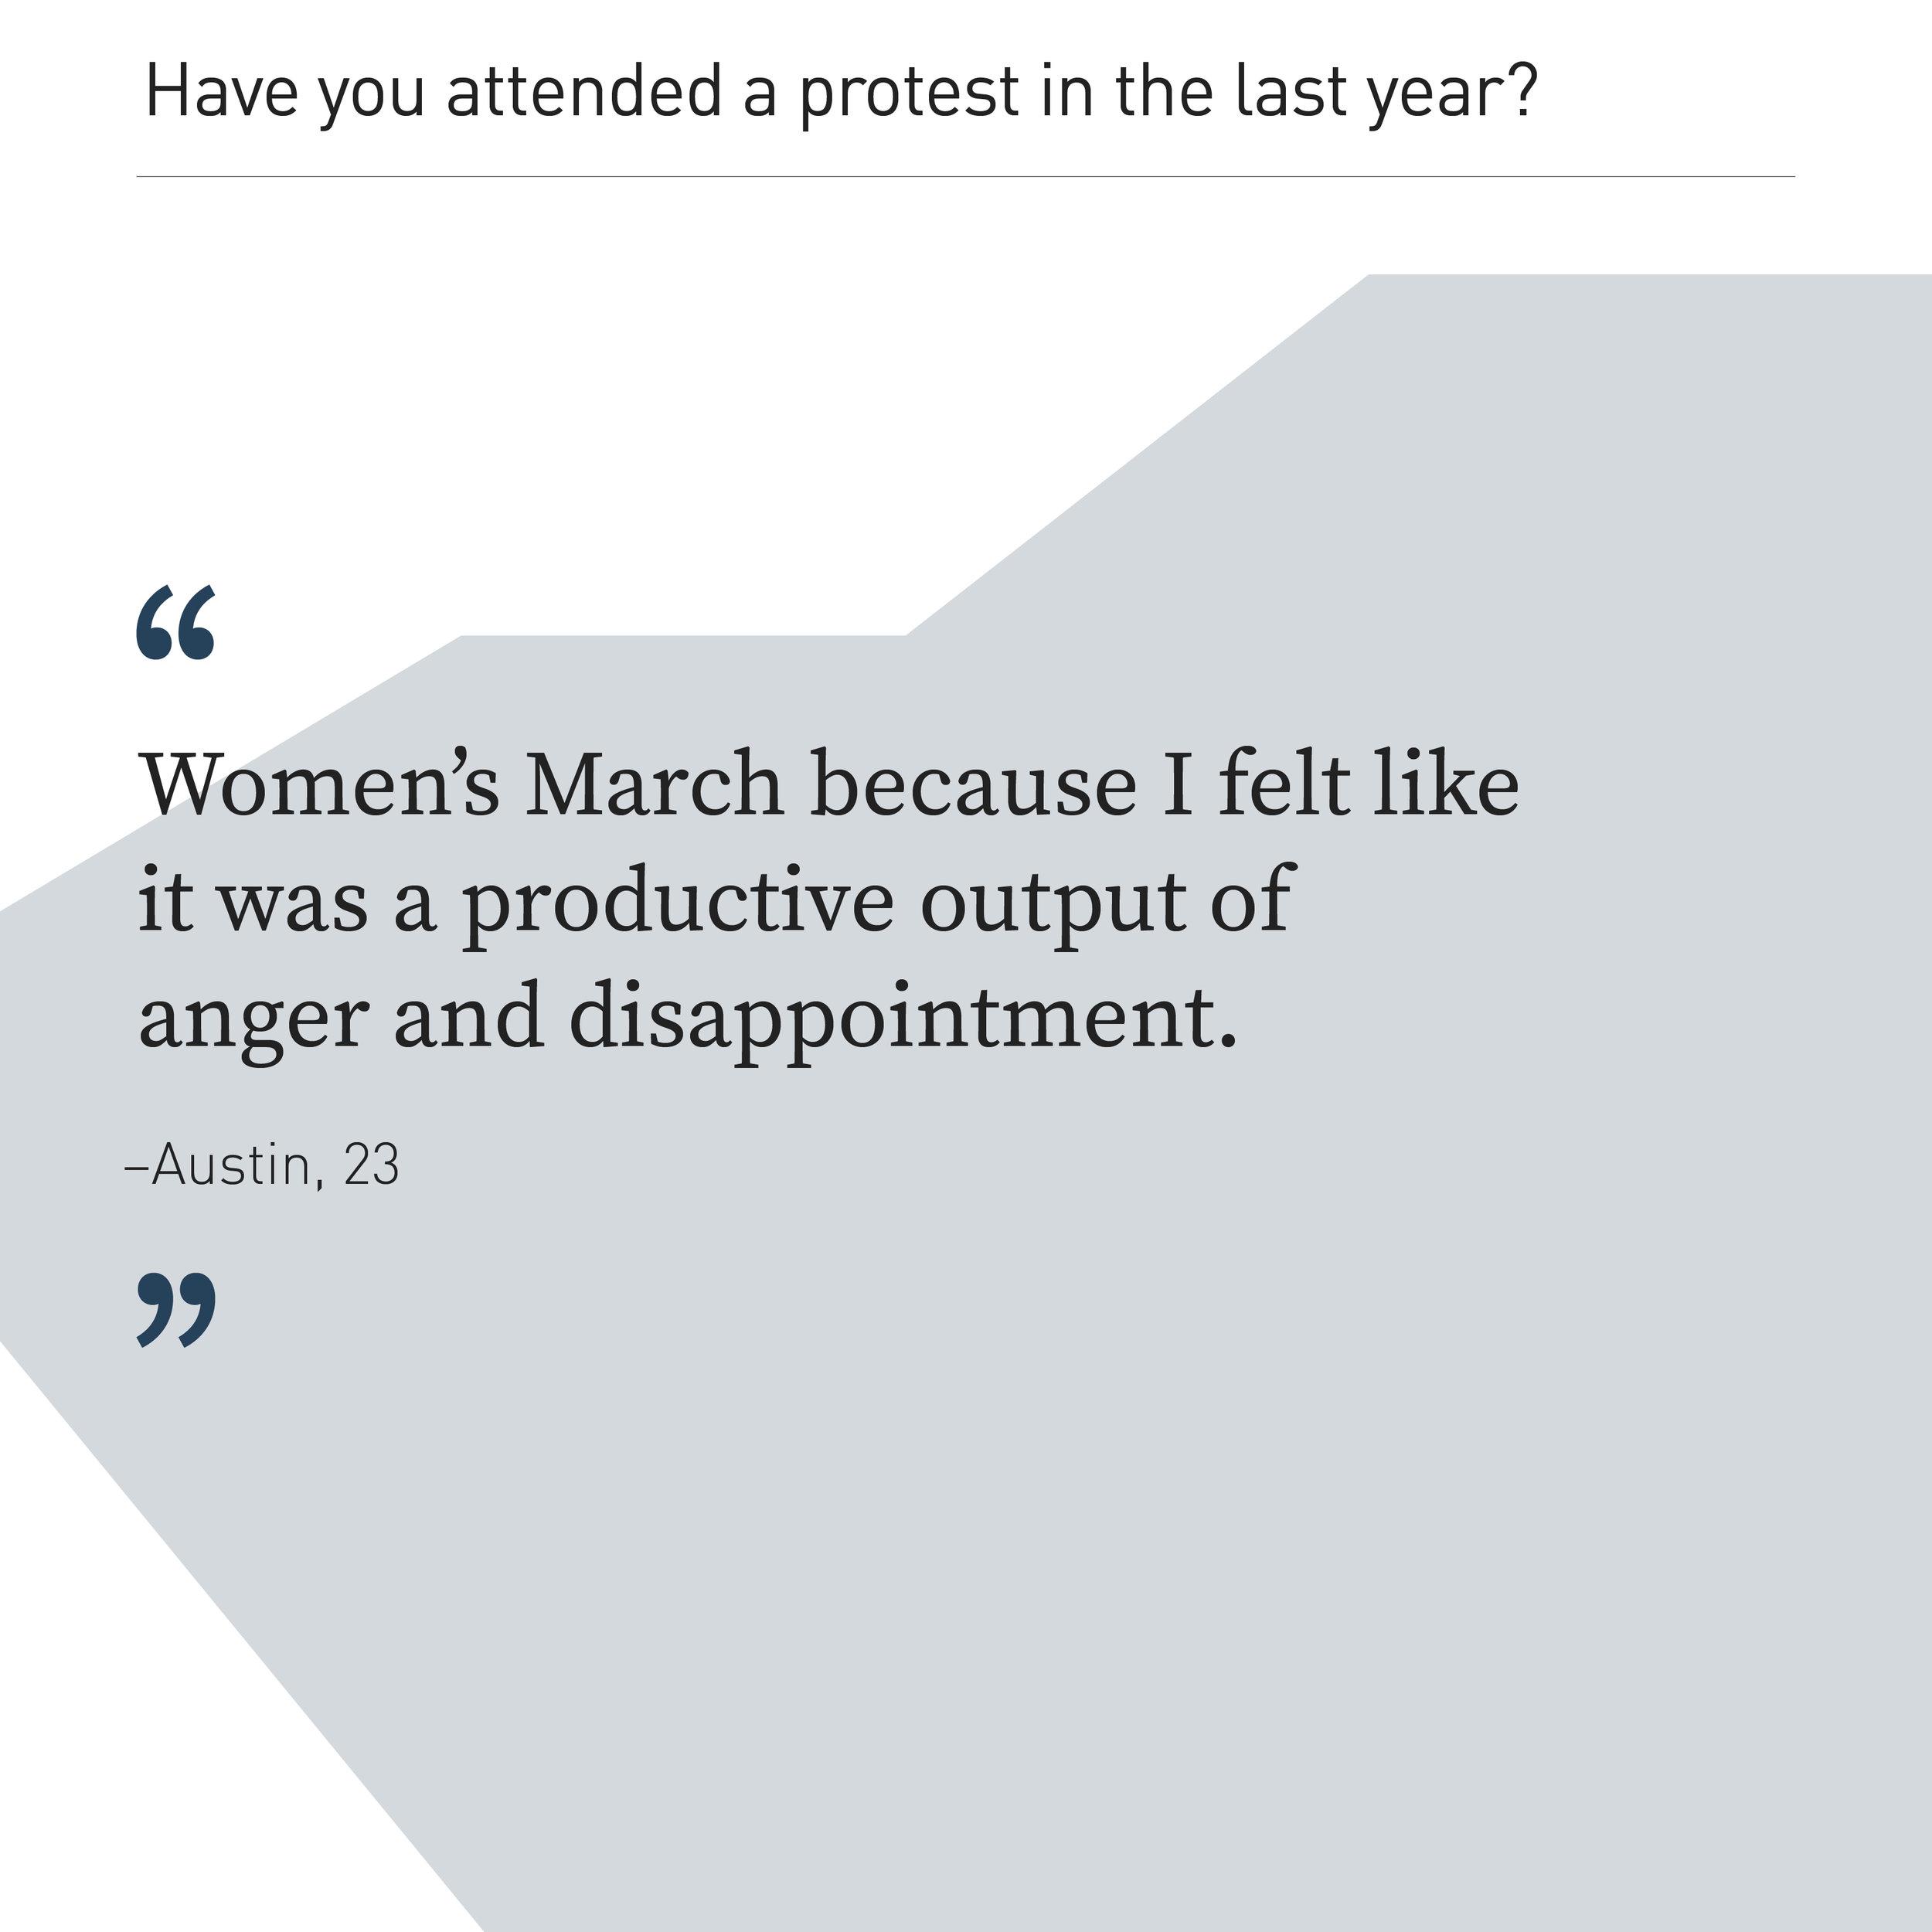 surveyquote-protest.jpg